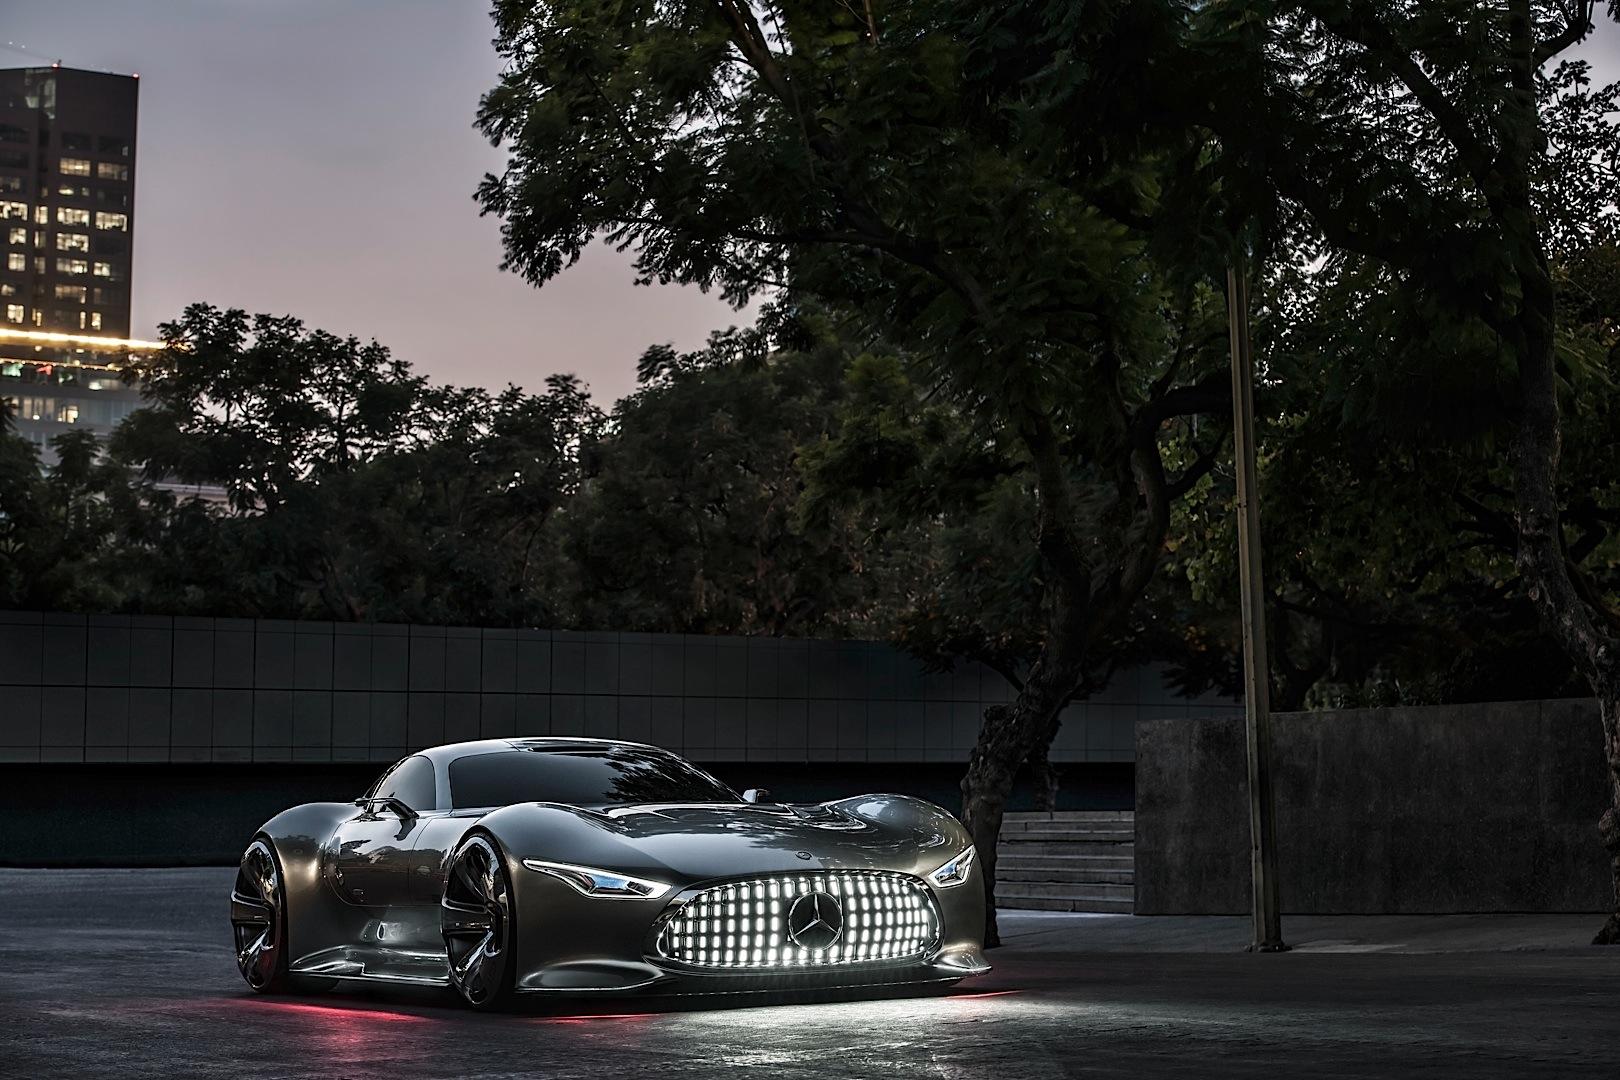 grand new avanza 1.5 g limited yaris trd sportivo cvt 2018 company wants to build the mercedes benz amg vision gran